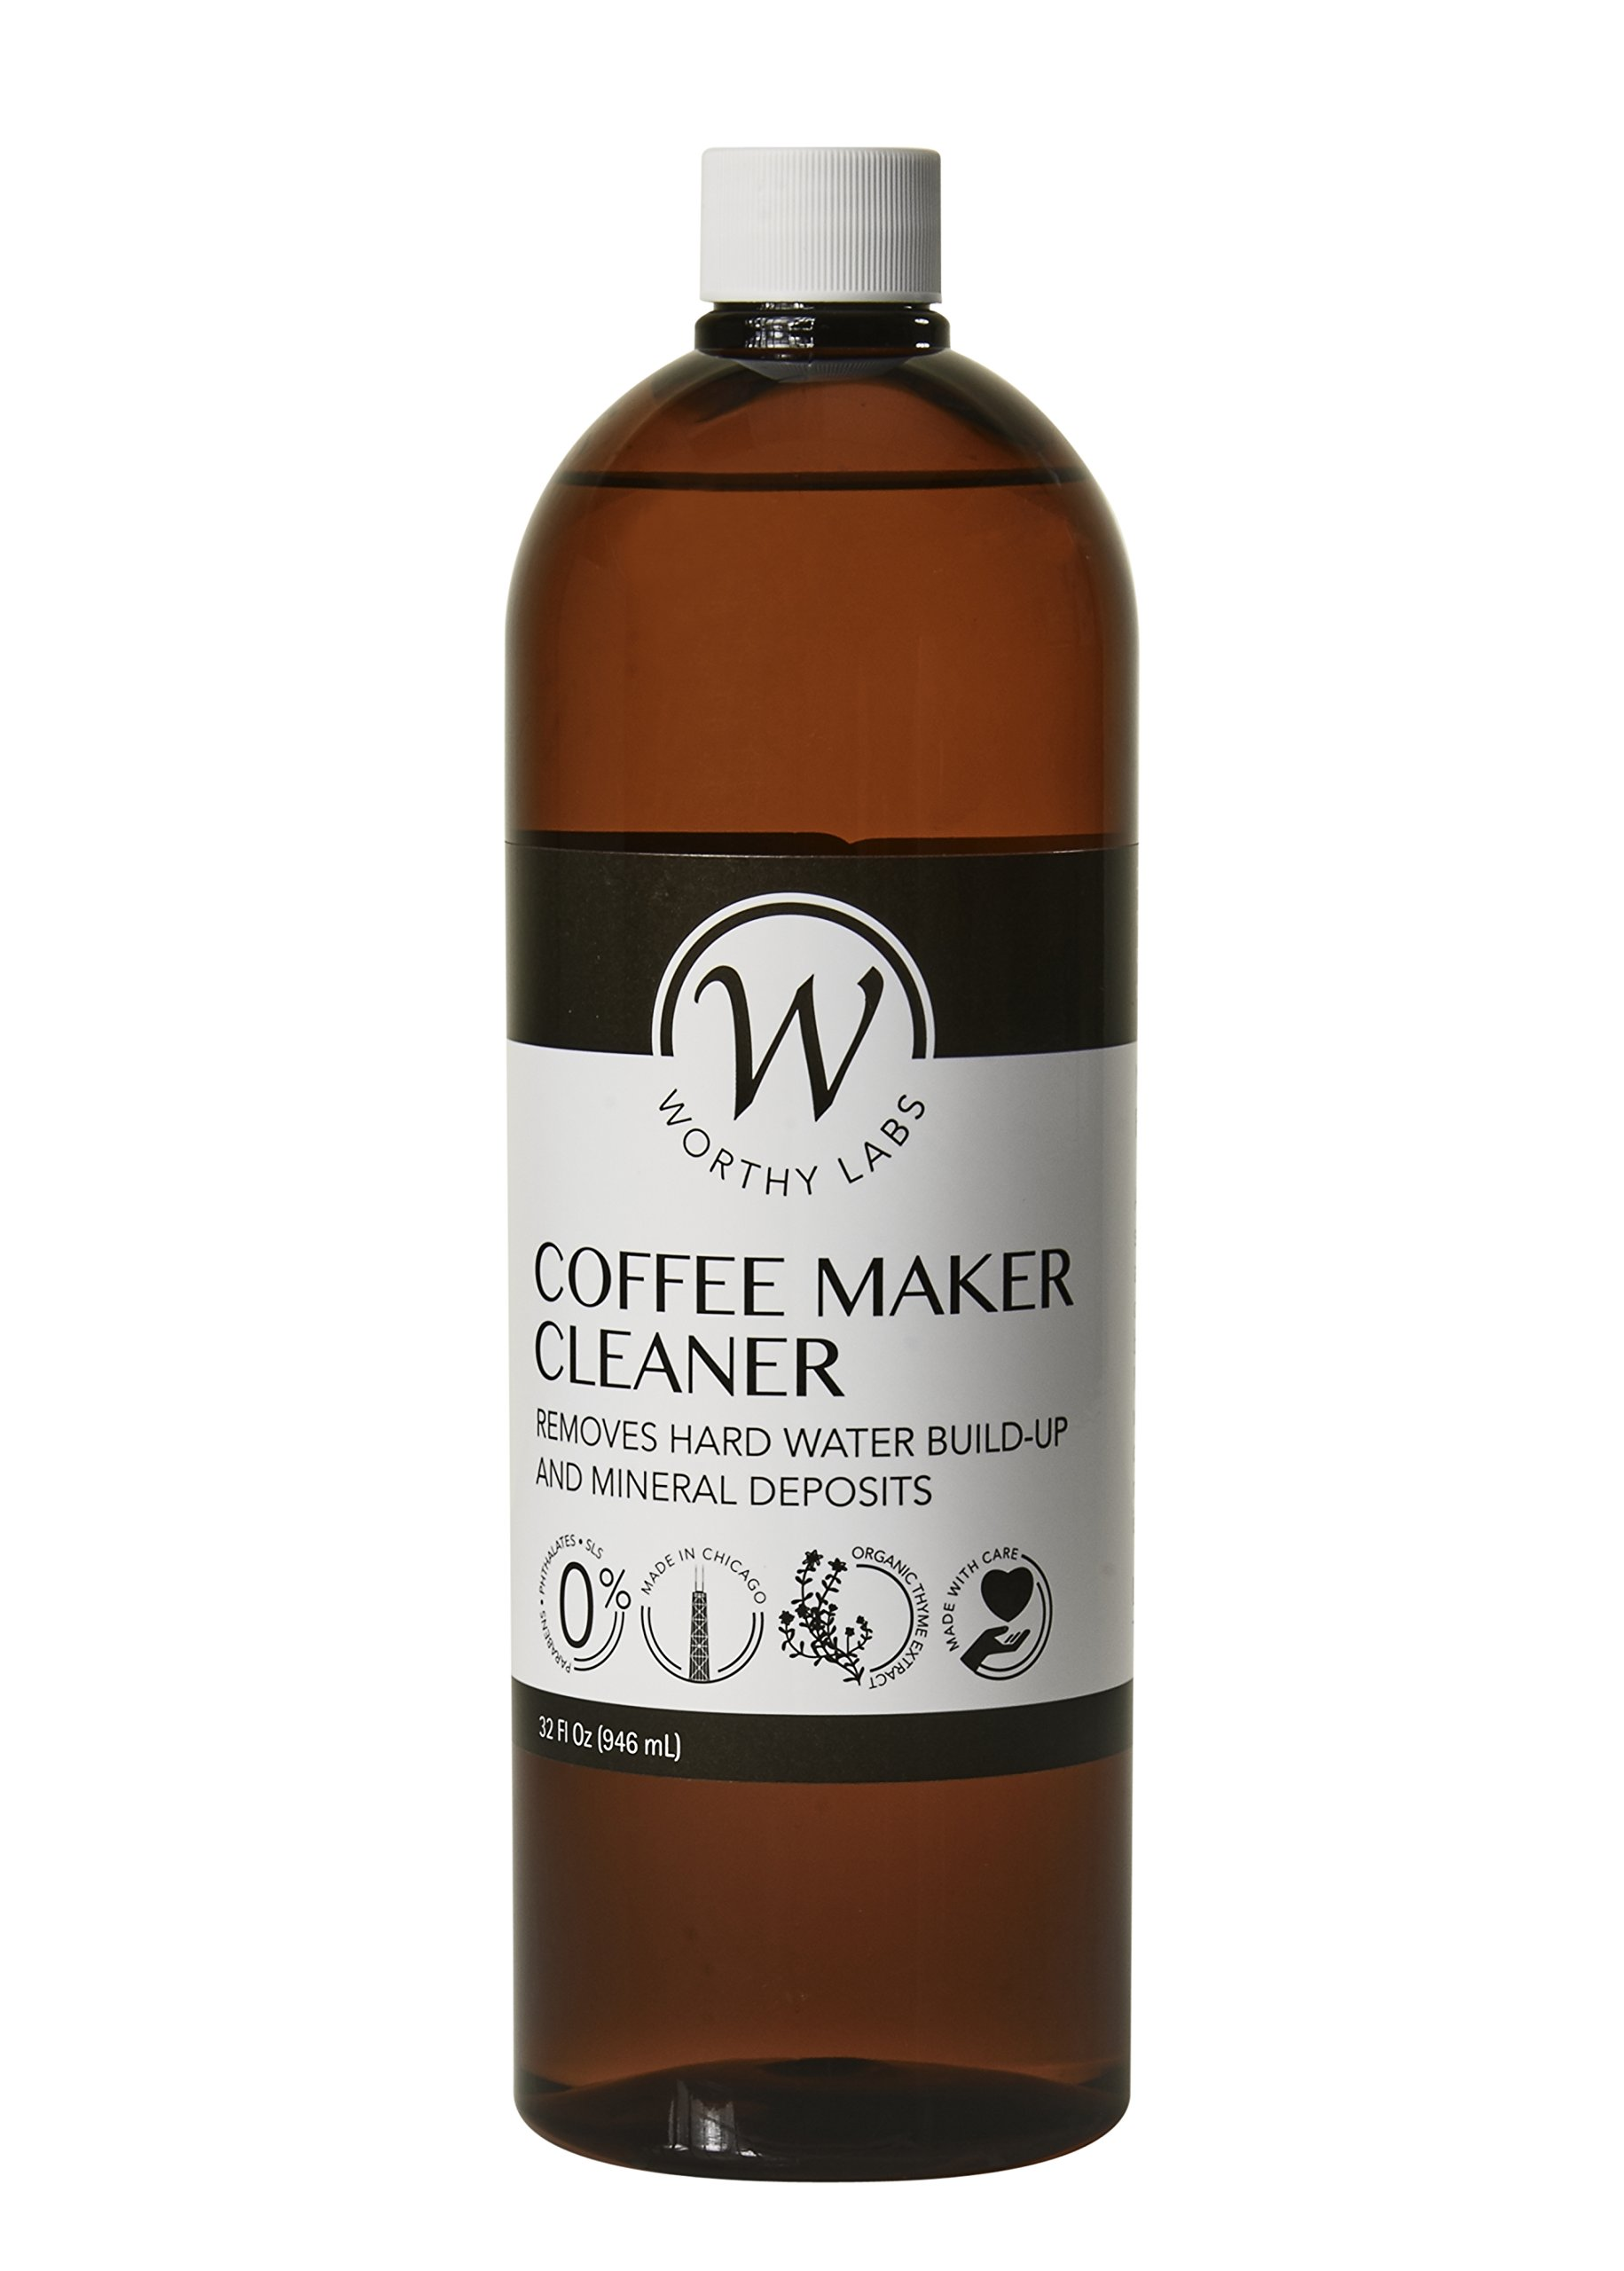 Coffee Maker Cleaner - Walmart.com